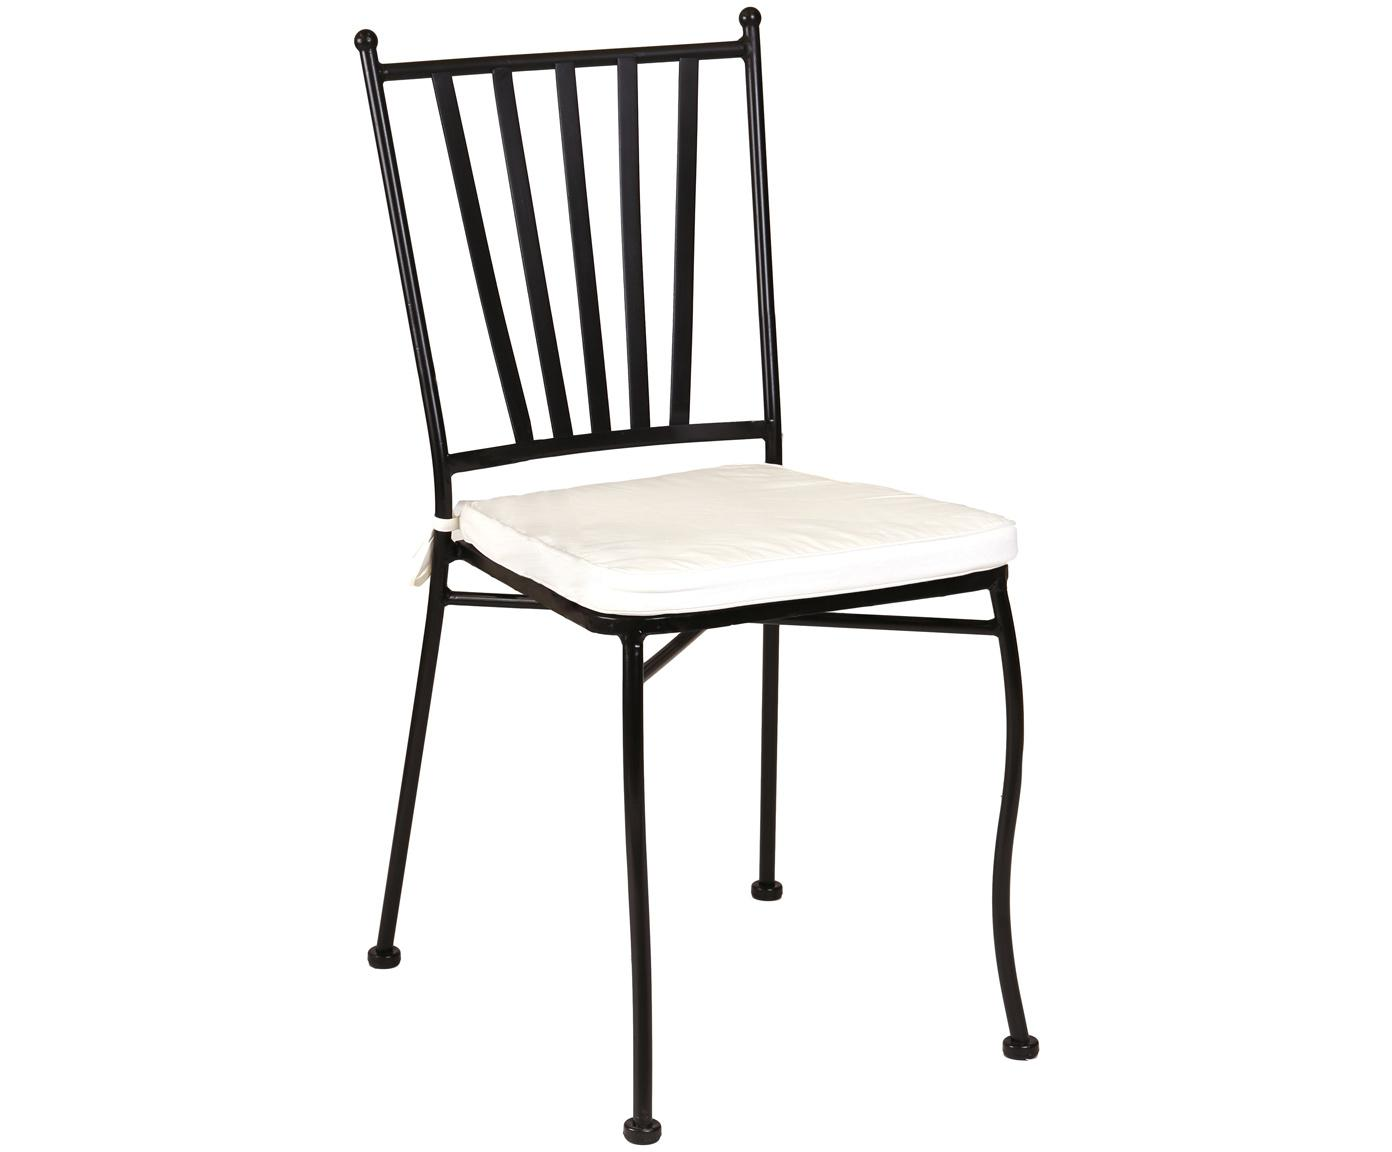 Silla de jardín Helen, Estructura: metal, recubierto en polv, Tapizado: poliéster, Negro, blanco, An 41 x F 53 cm